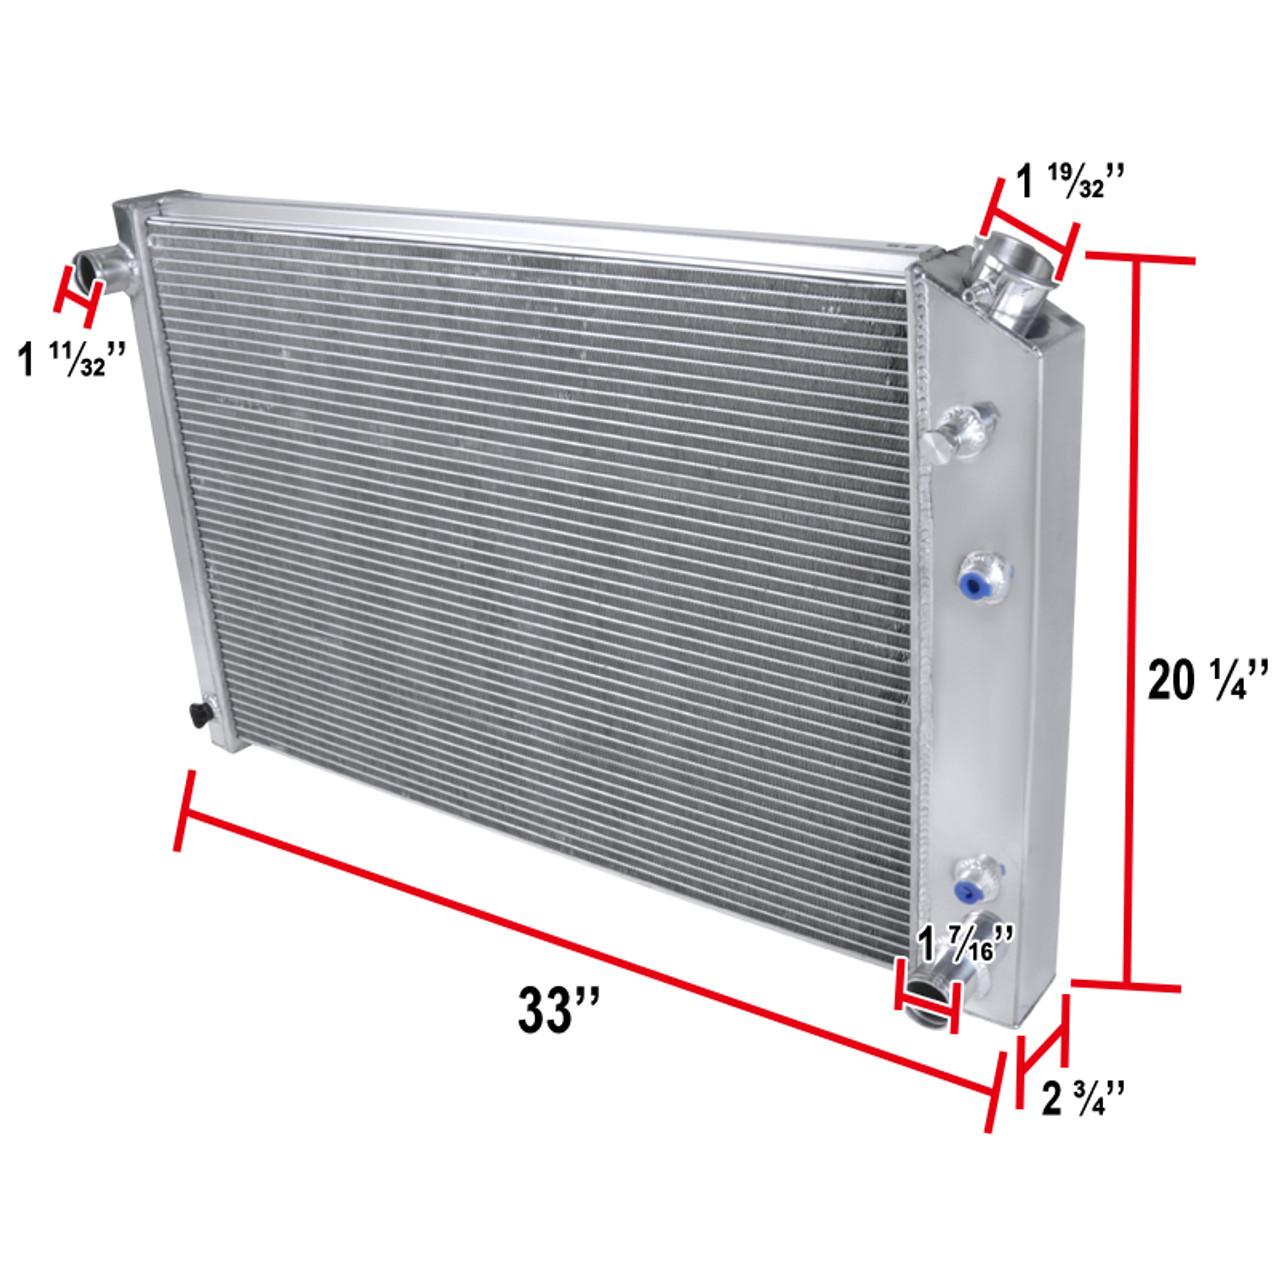 Spec-D Tuning For Chevy C//K C10 C20 K10 K20 3-Row Chrome Aluminum Performance Cooling Radiator